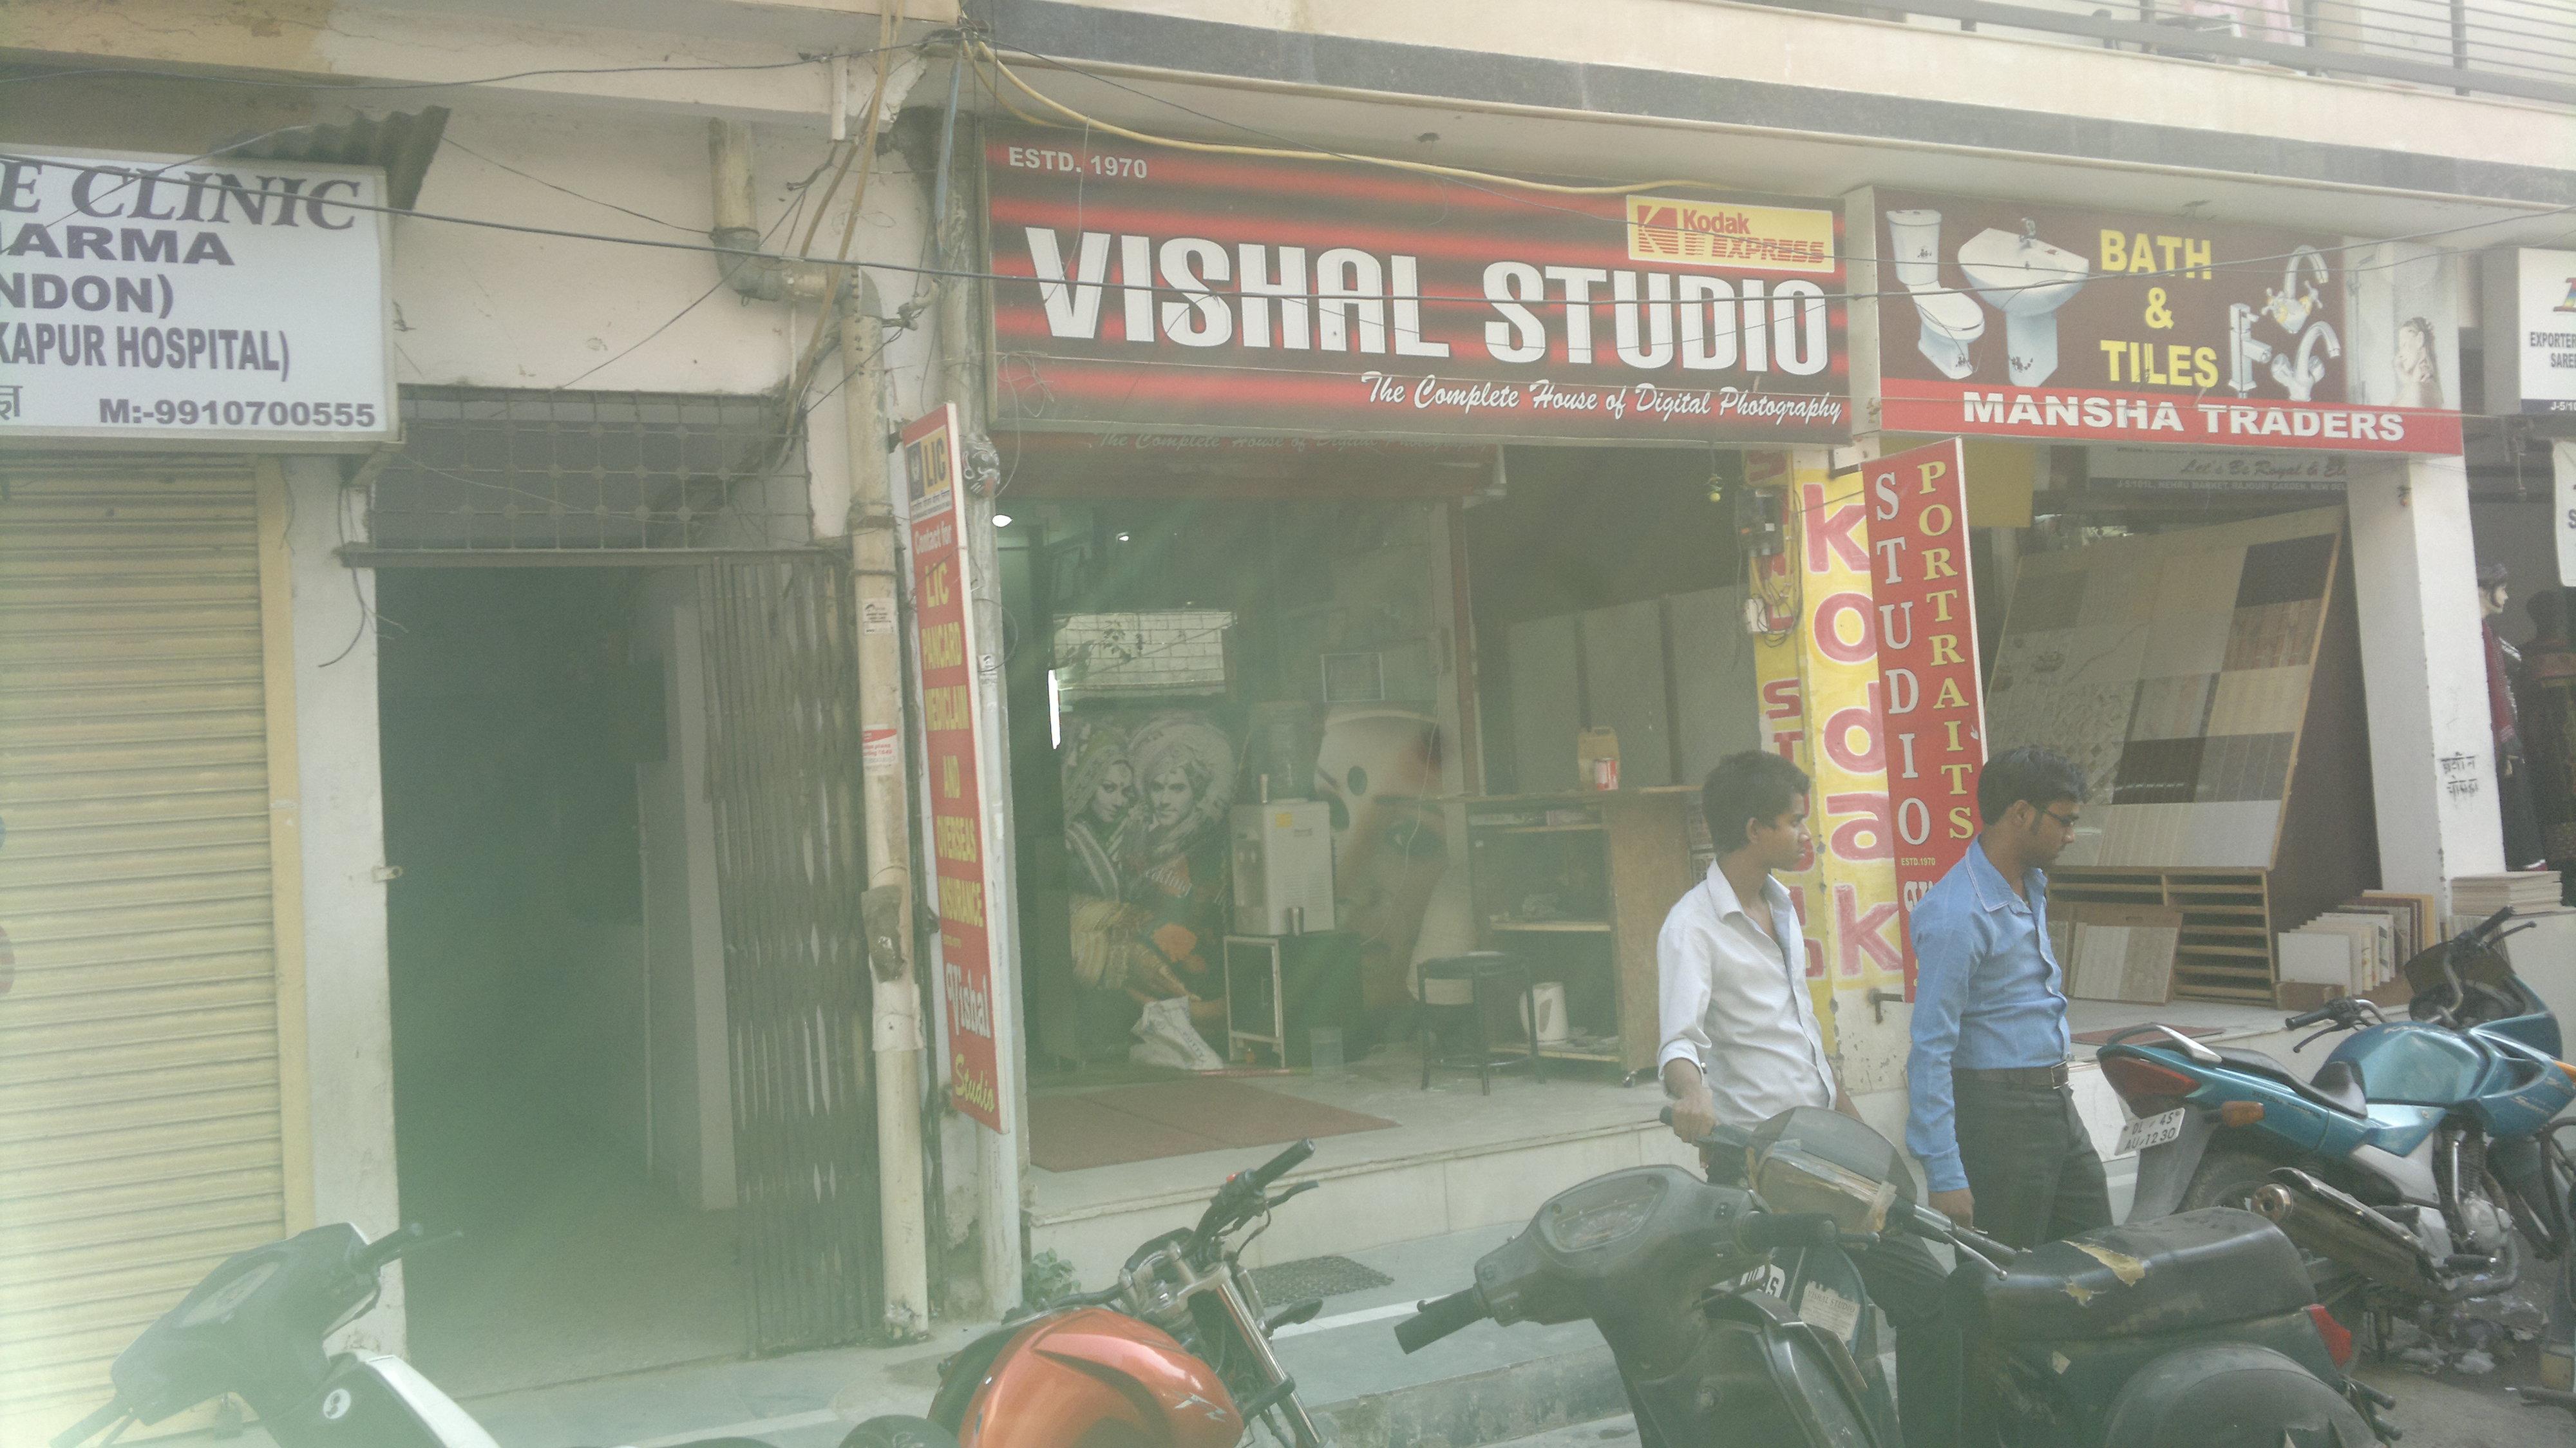 Photography Studio Samy Arora